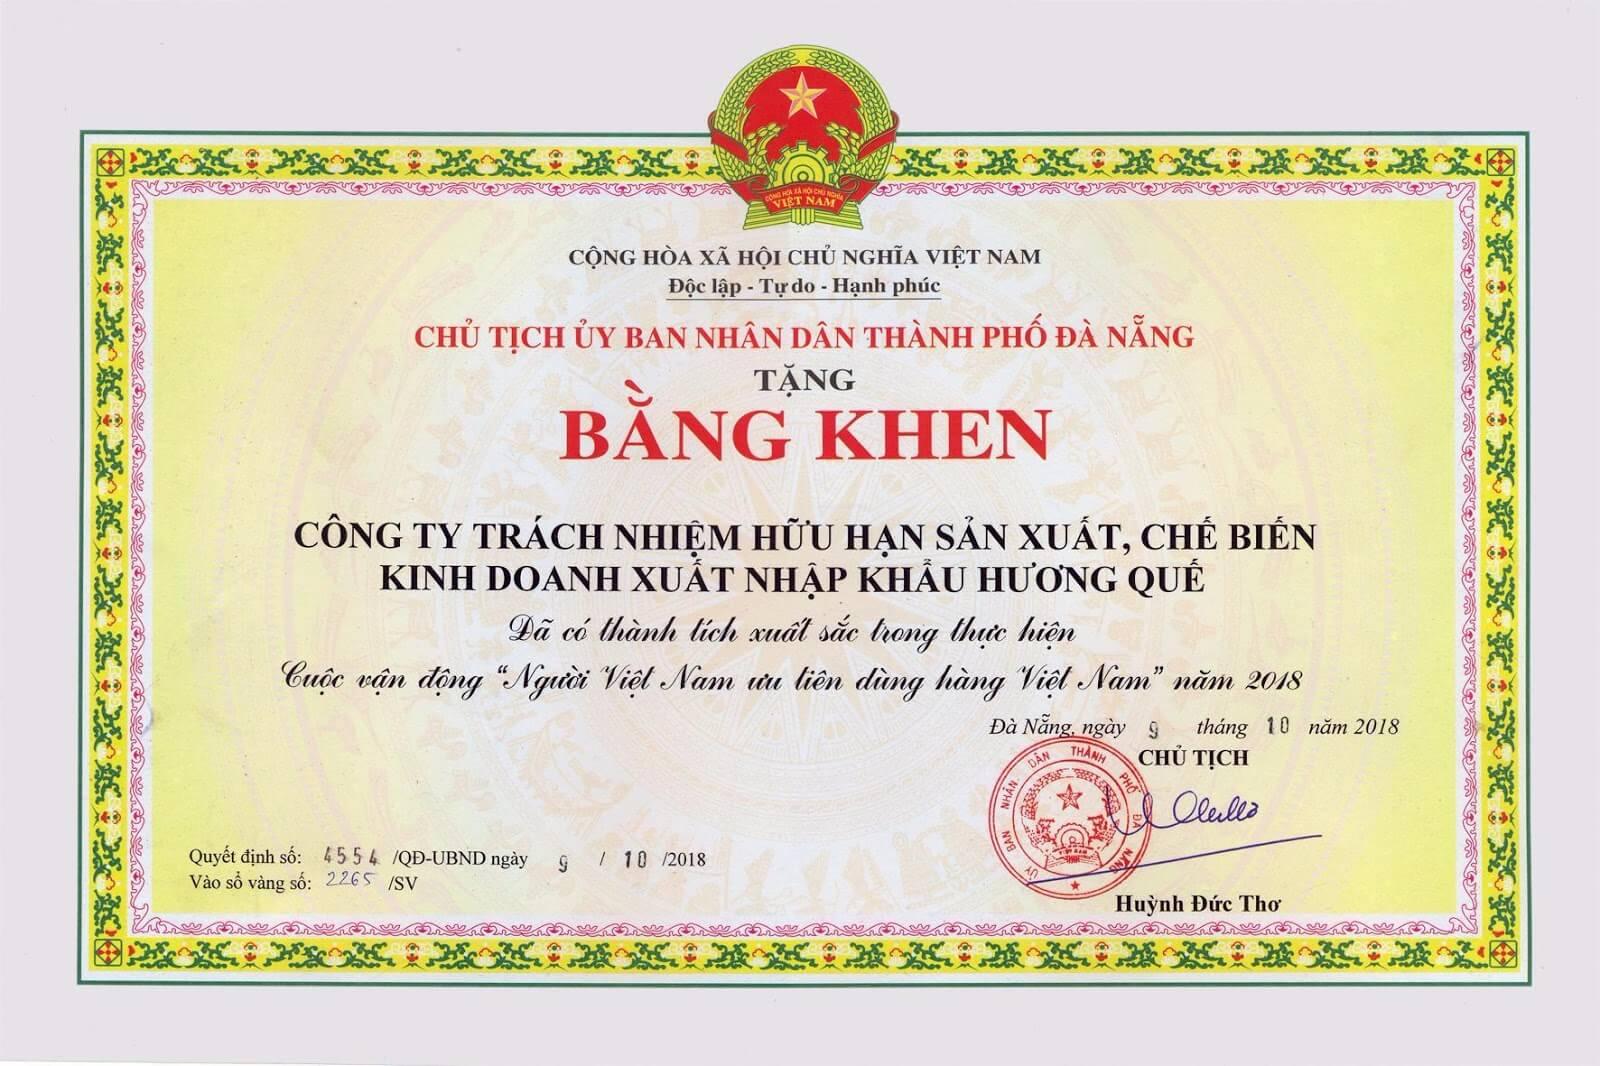 huong-que-doanh-nghiep-tieu-bieu-duoc-da-nang-ton-vinh-trong-cuoc-van-dong-nguoi-nc37-h2